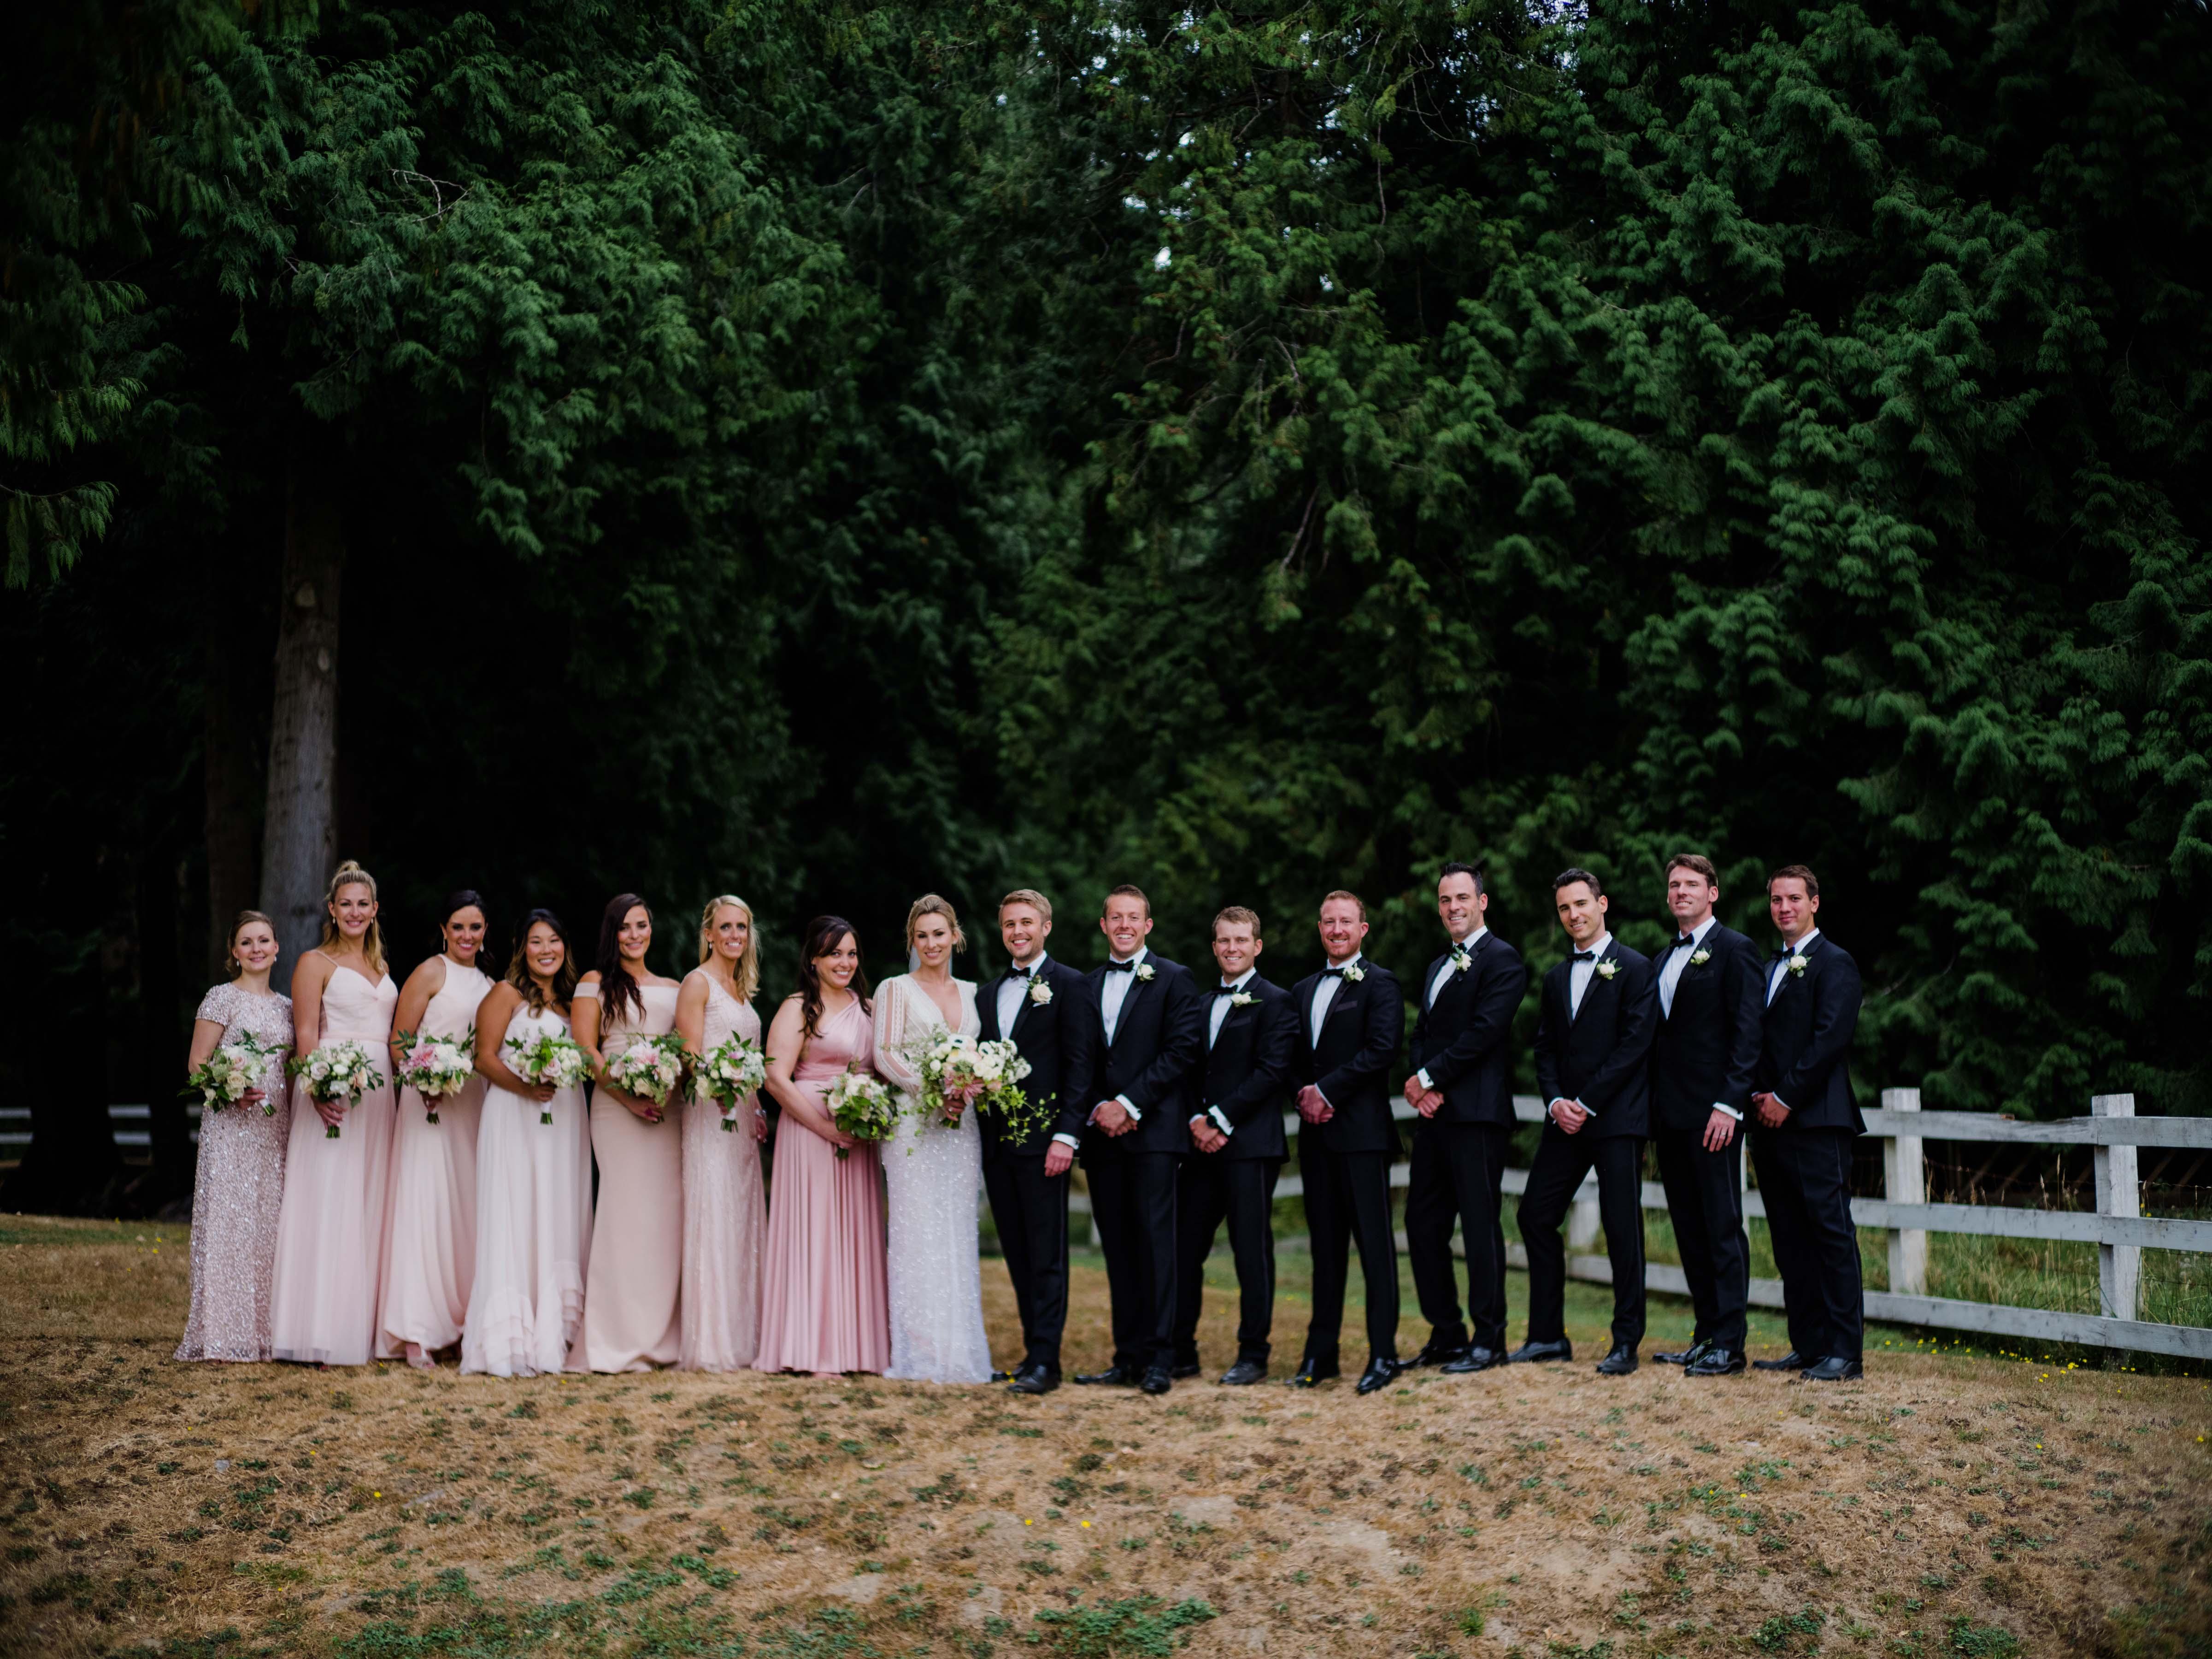 Bridal party at Chateau Lill